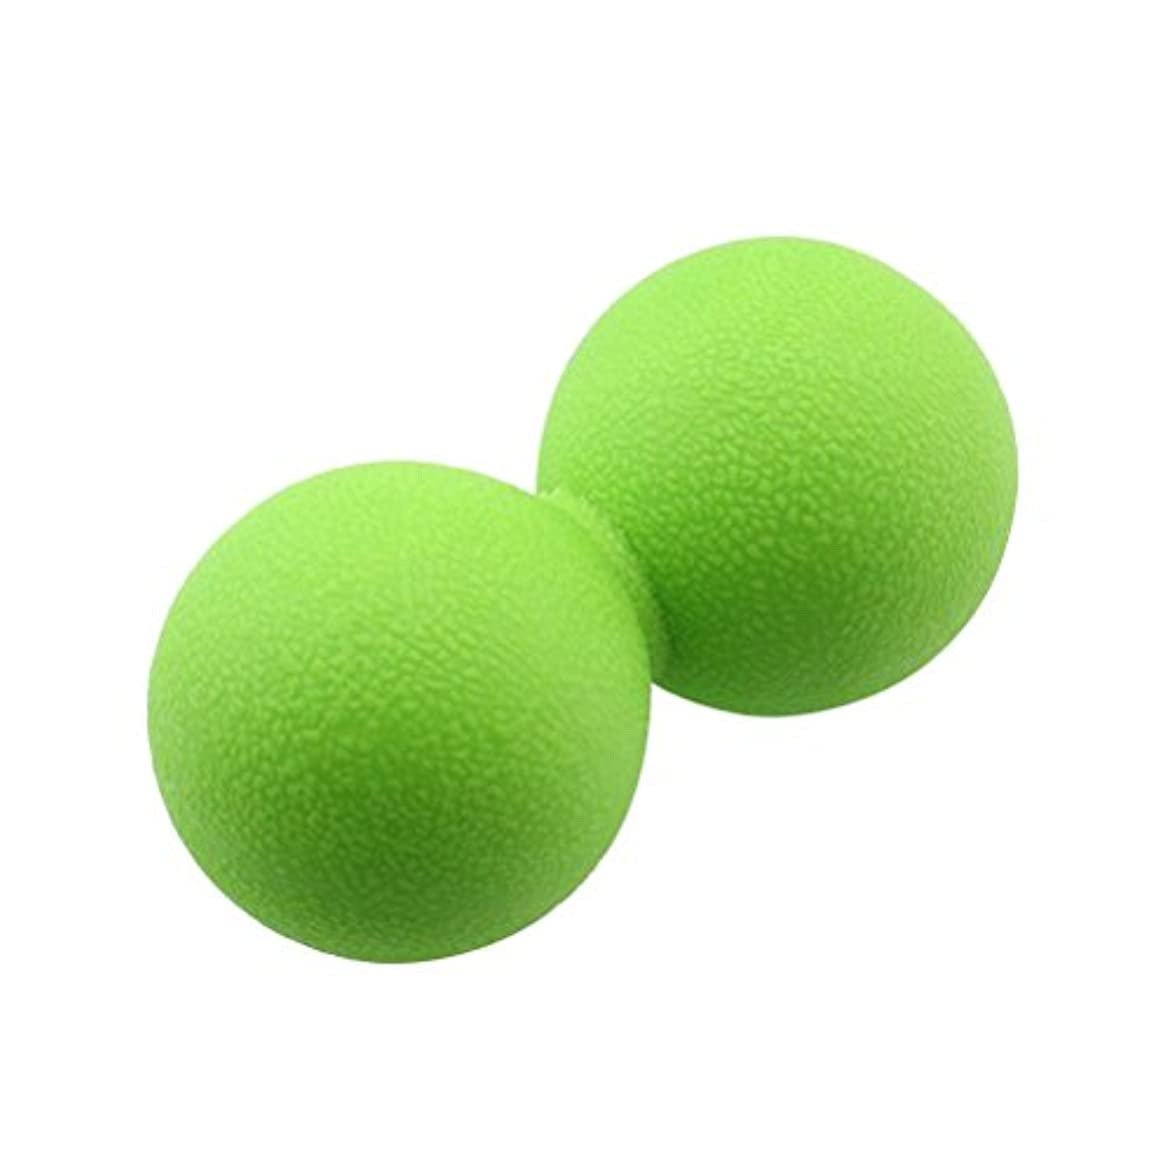 VORCOOL マッサージボール ストレッチボール ハードタイプ トリガーポイント トレーニング 背中 肩こり 腰 ふくらはぎ 足裏 ツボ押しグッズ スーパーハードタイプ 筋肉痛を改善 運動前後(緑)